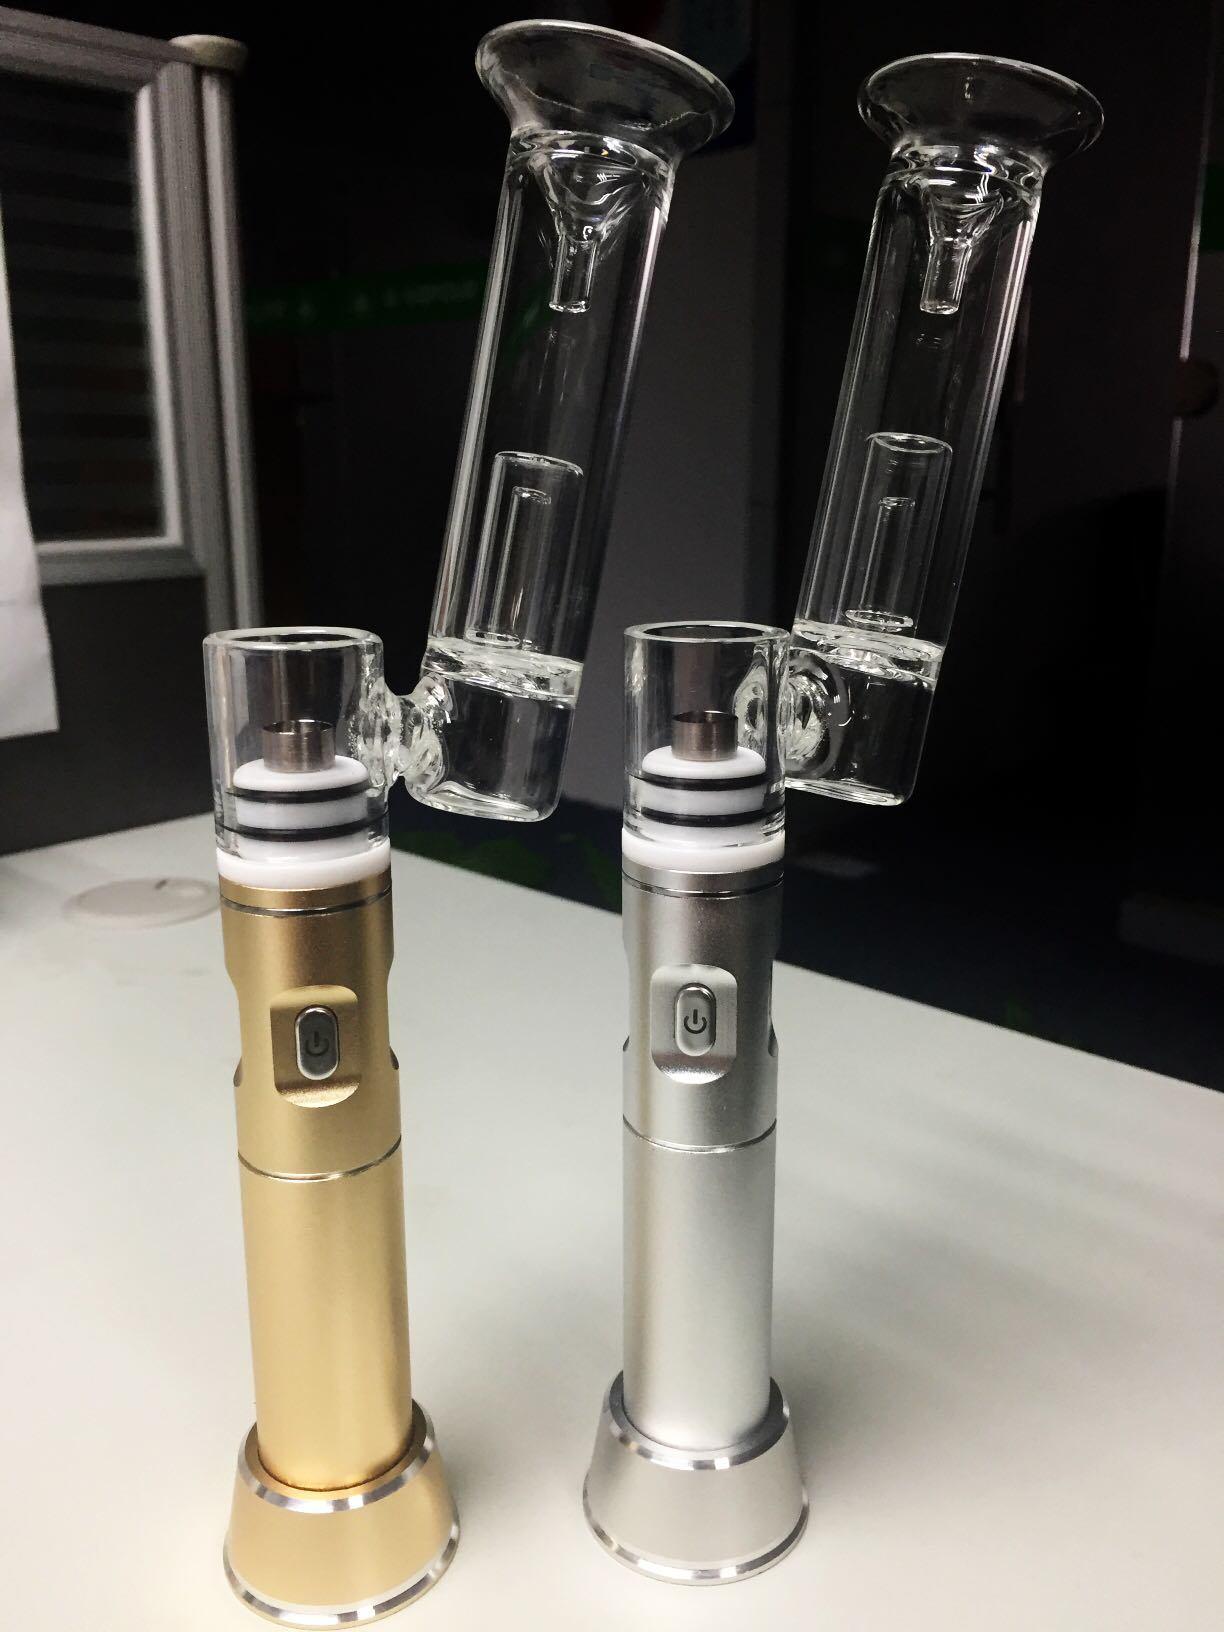 [Hot Item] Portable Dabbing Enail DAB Pen H-Enail G9 Henail Herb Oil Rigs  Glass Smoking Pipe Vaporizer